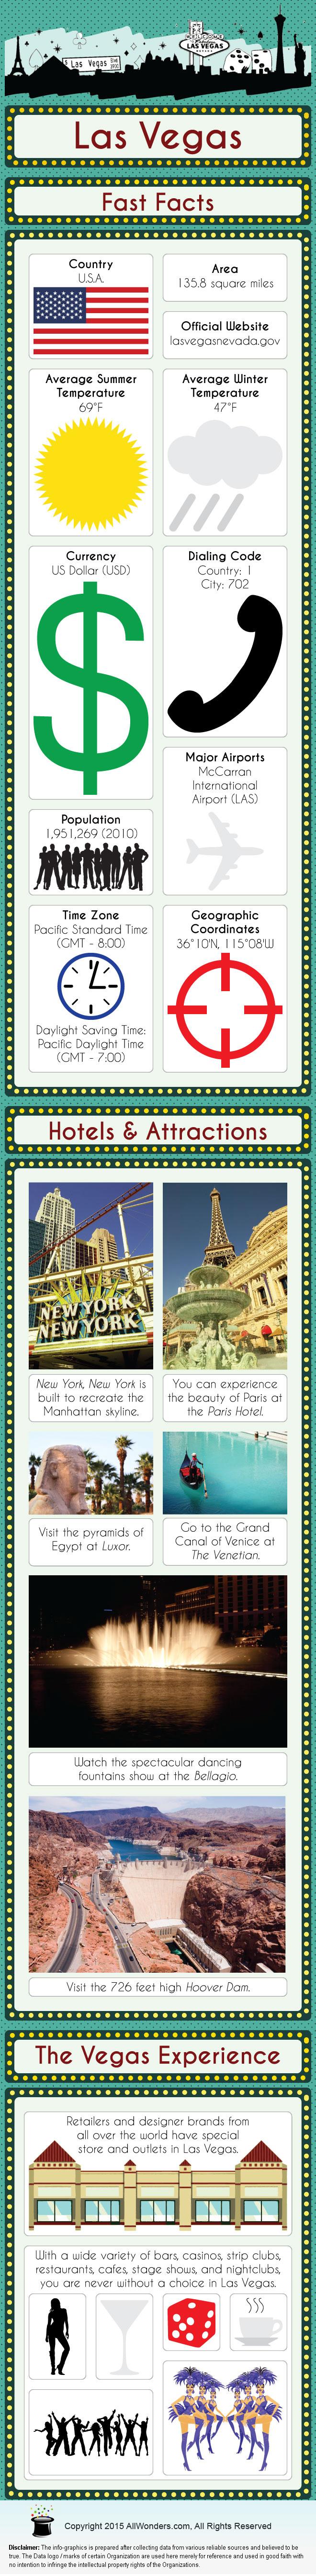 Las Vegas Travel Infographic